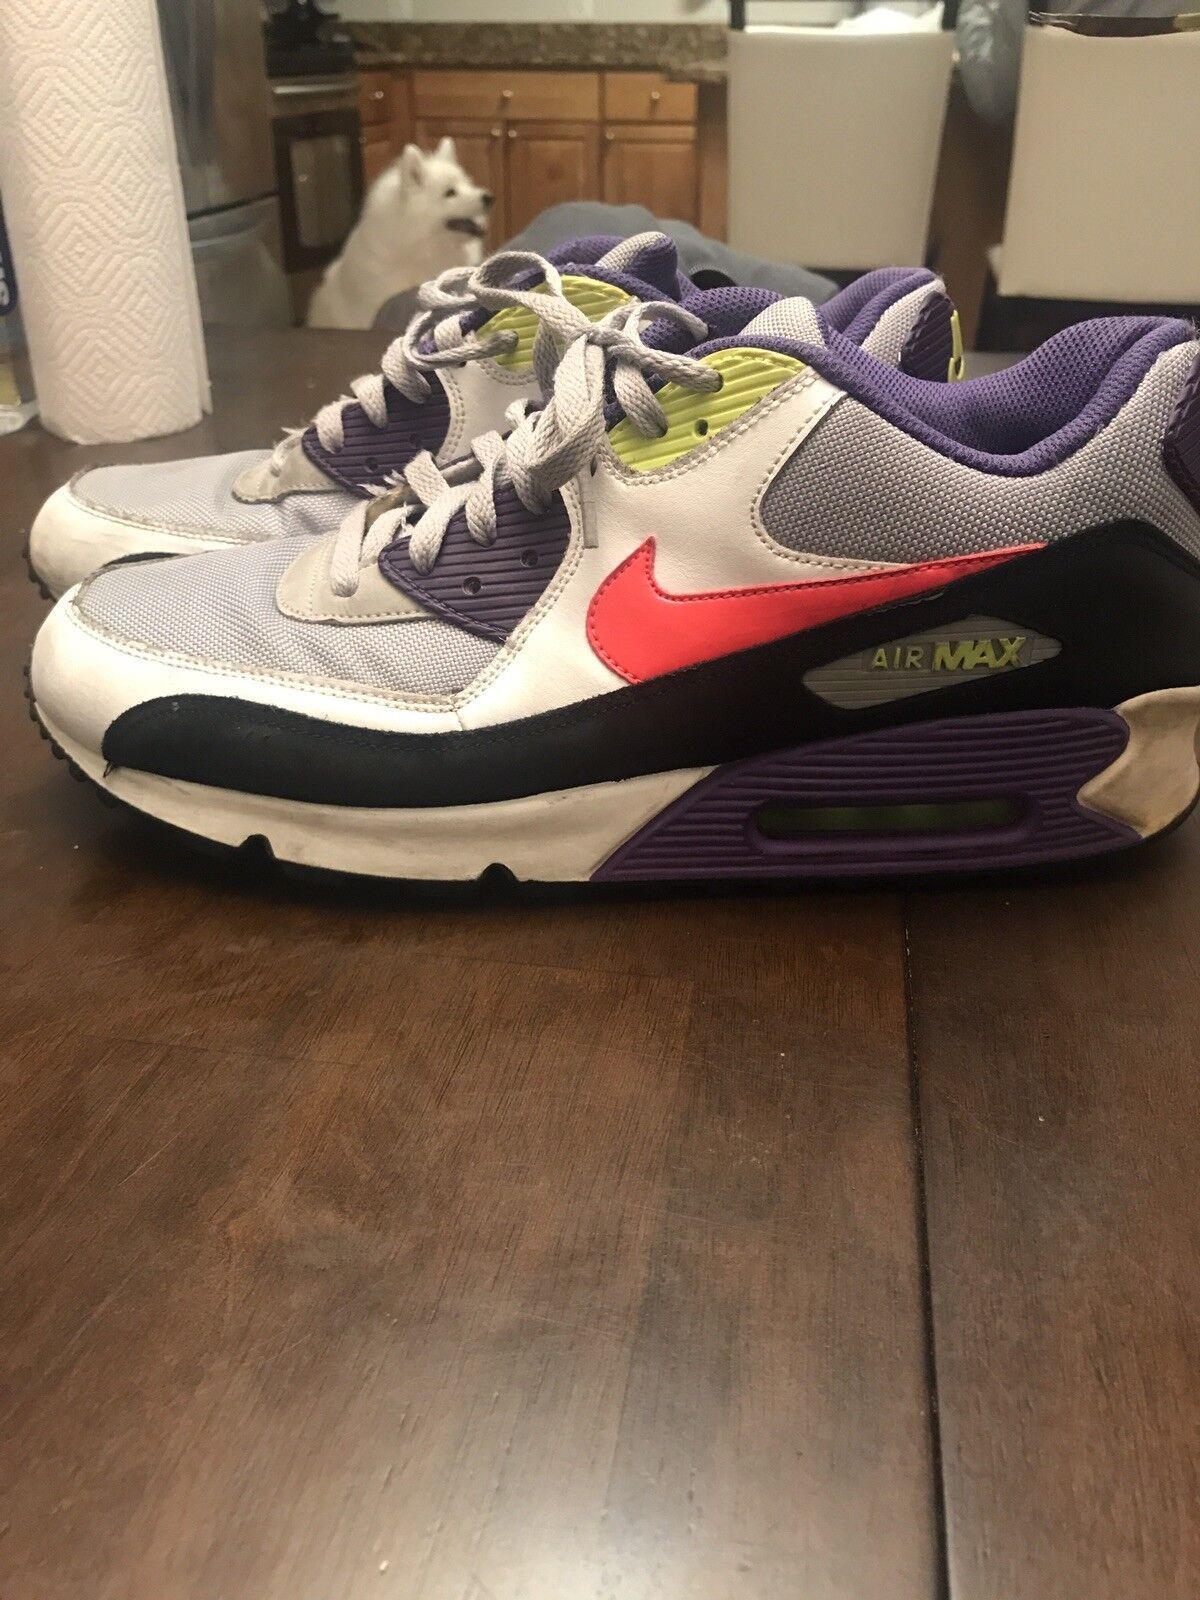 Nike Air Max 90 I Am The Rules 325018 024 Wolf Grey Solar Red Purple Volt Sz 12